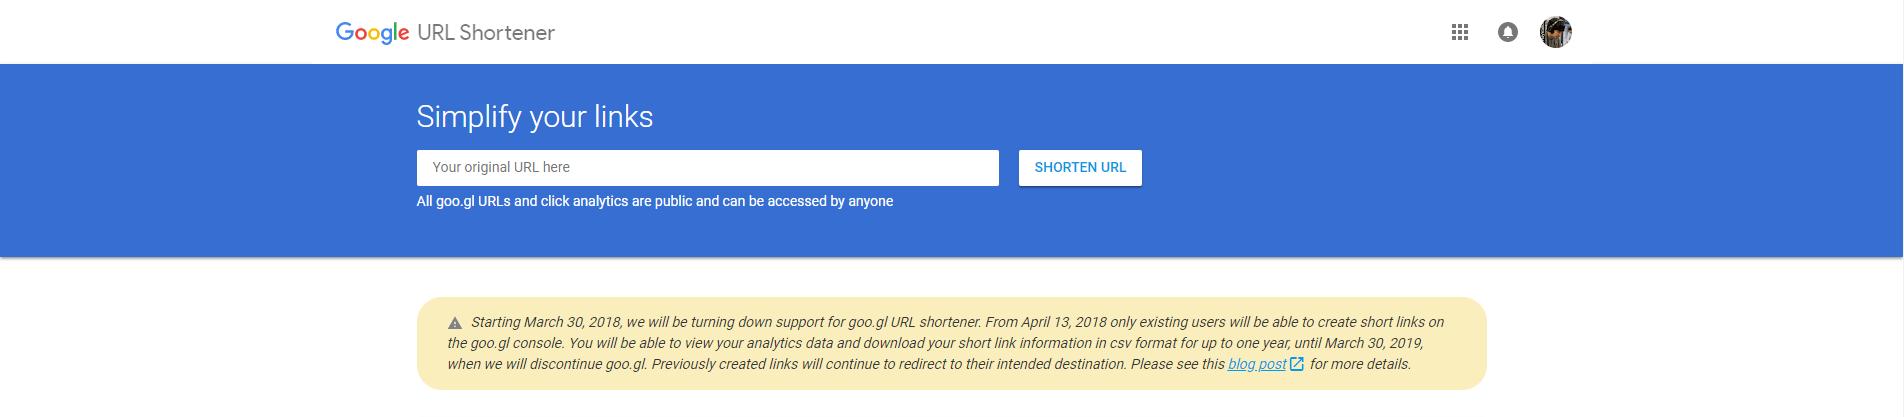 Google ประกาศยุติการให้บริการ goo.gl เว็บไซต์ย่อ URL